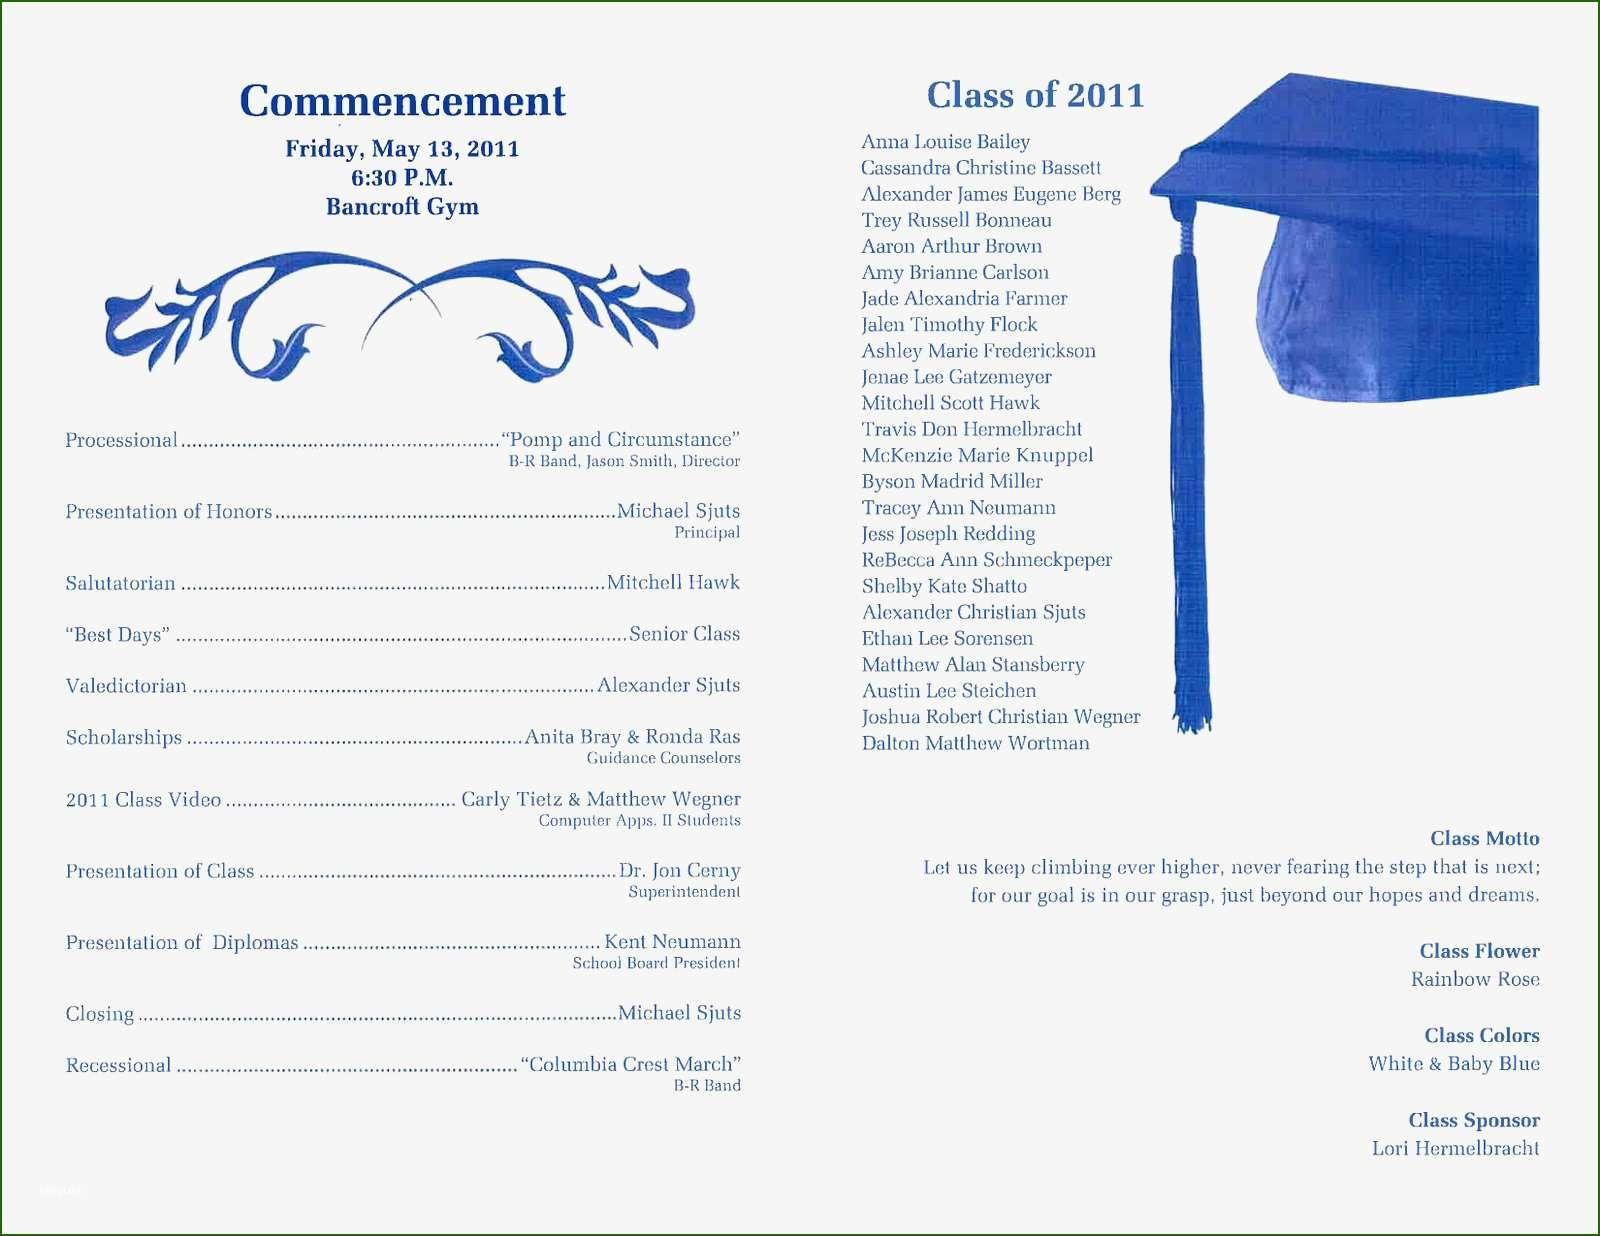 19 Excellent Graduation Ceremony Program Template In 2020 Ceremony Program Template Preschool Graduation Kindergarten Graduation Programs